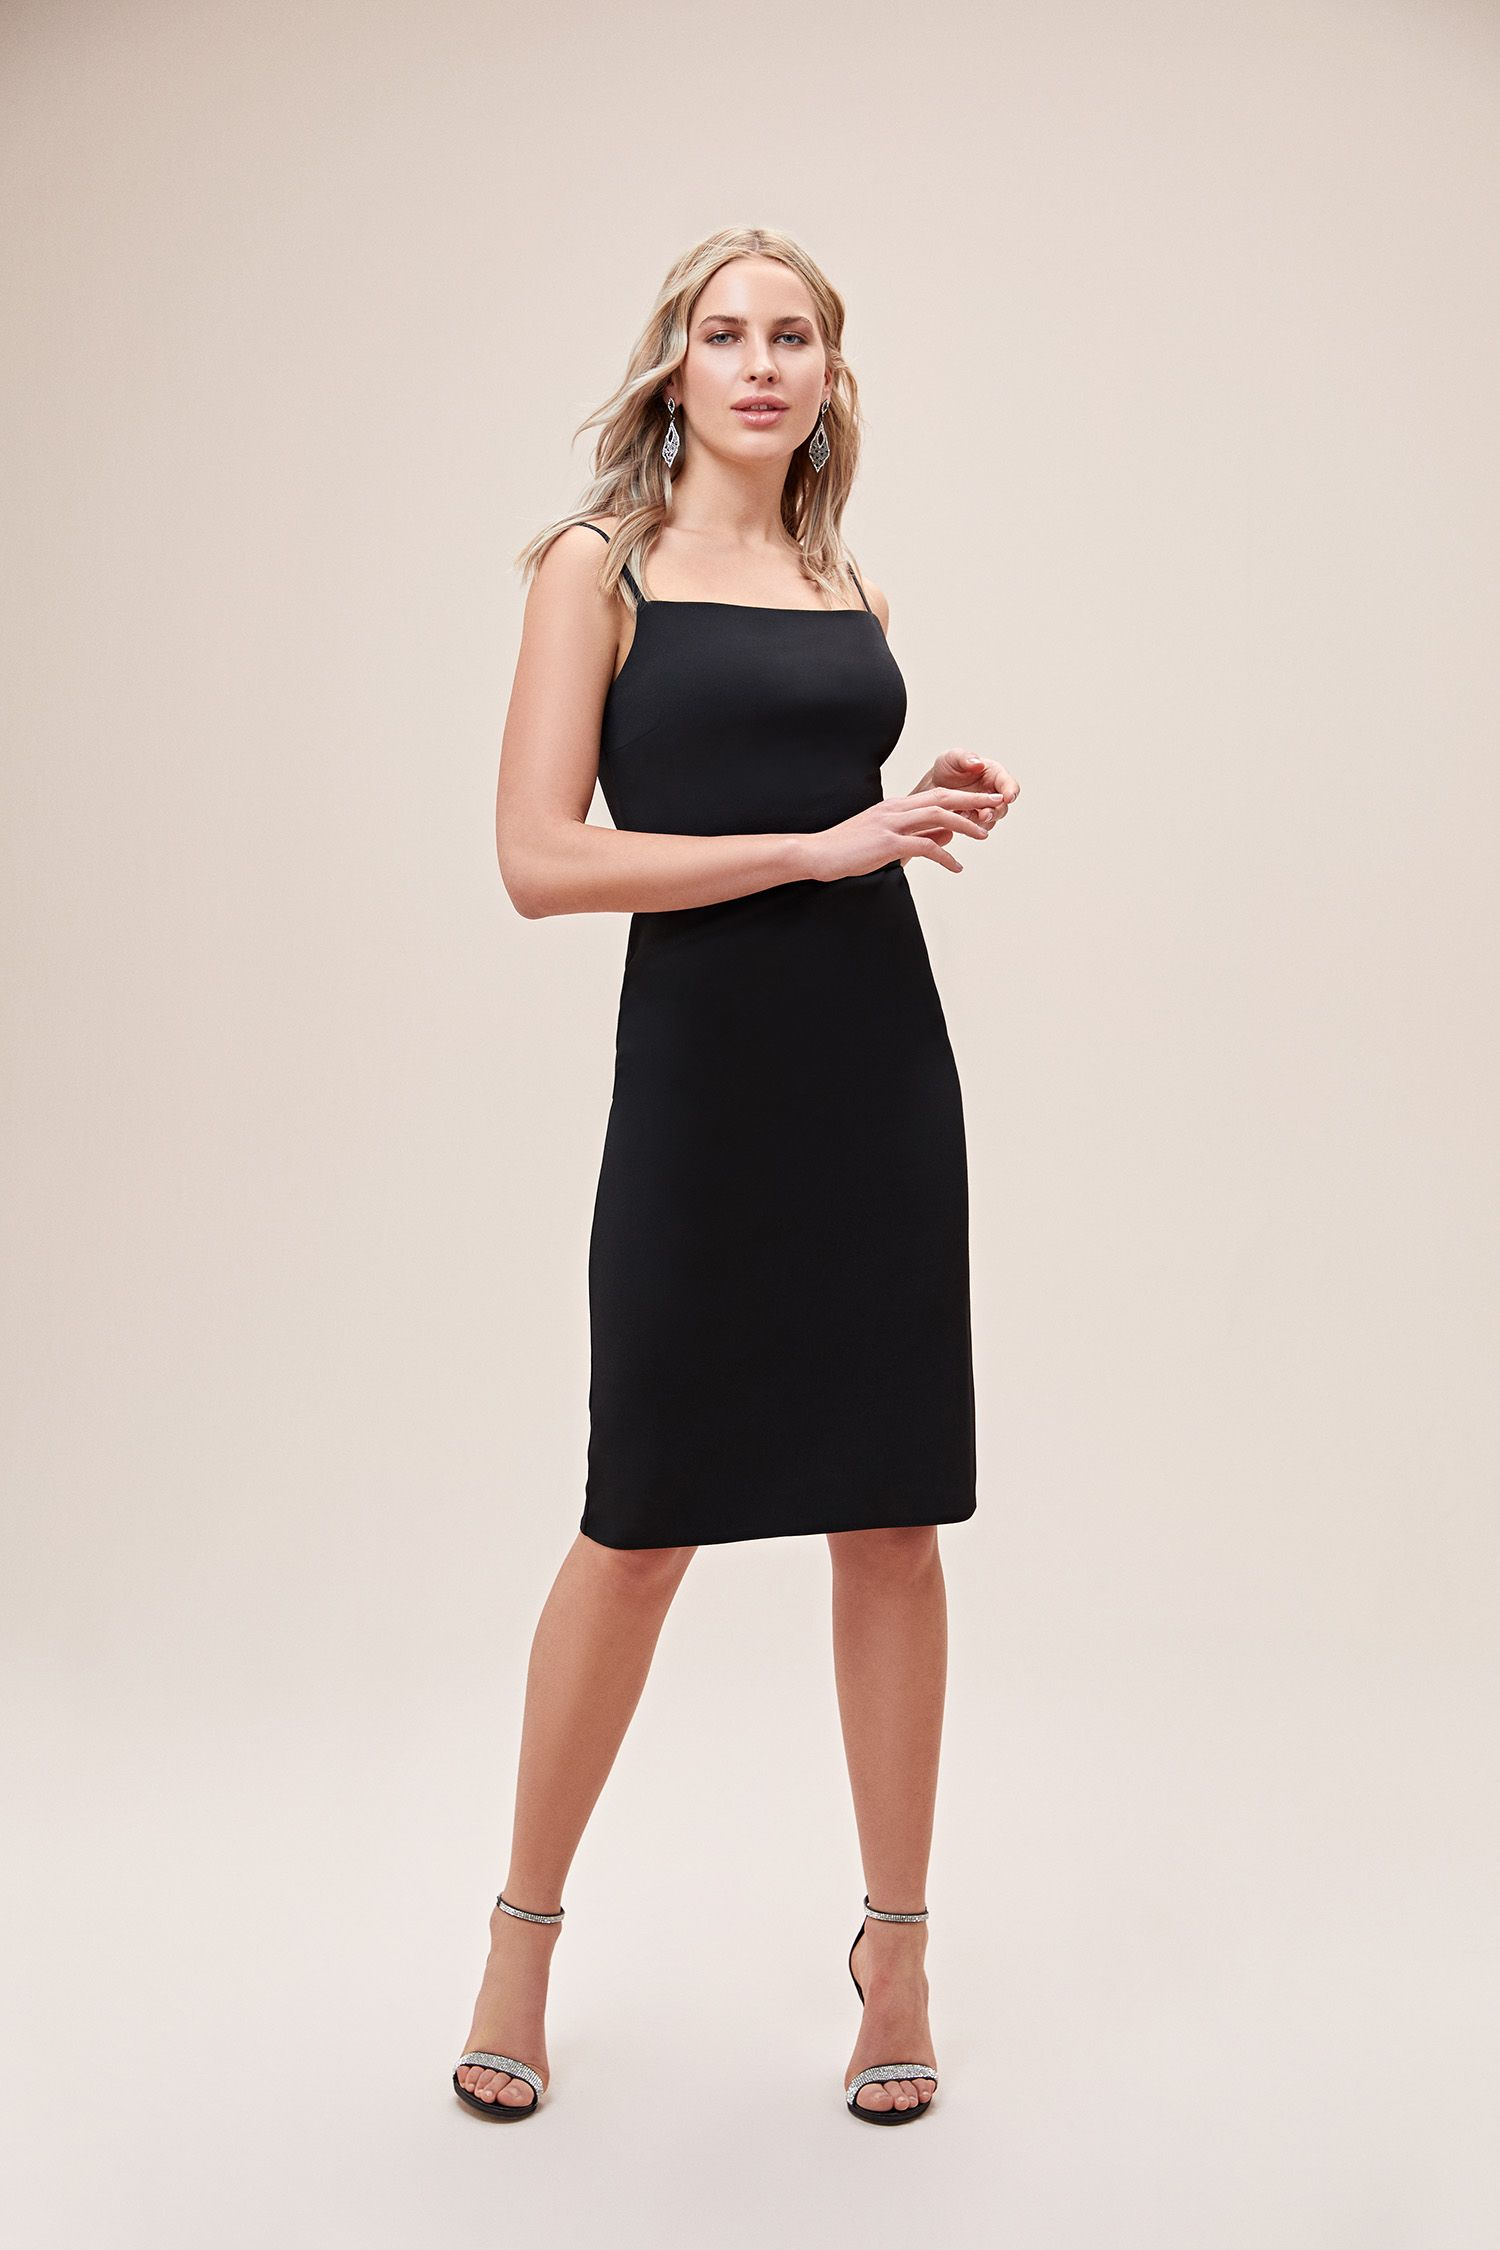 Siyah Ince Askili Midi Boy Krep Elbise 2020 Elbise The Dress Elbiseler